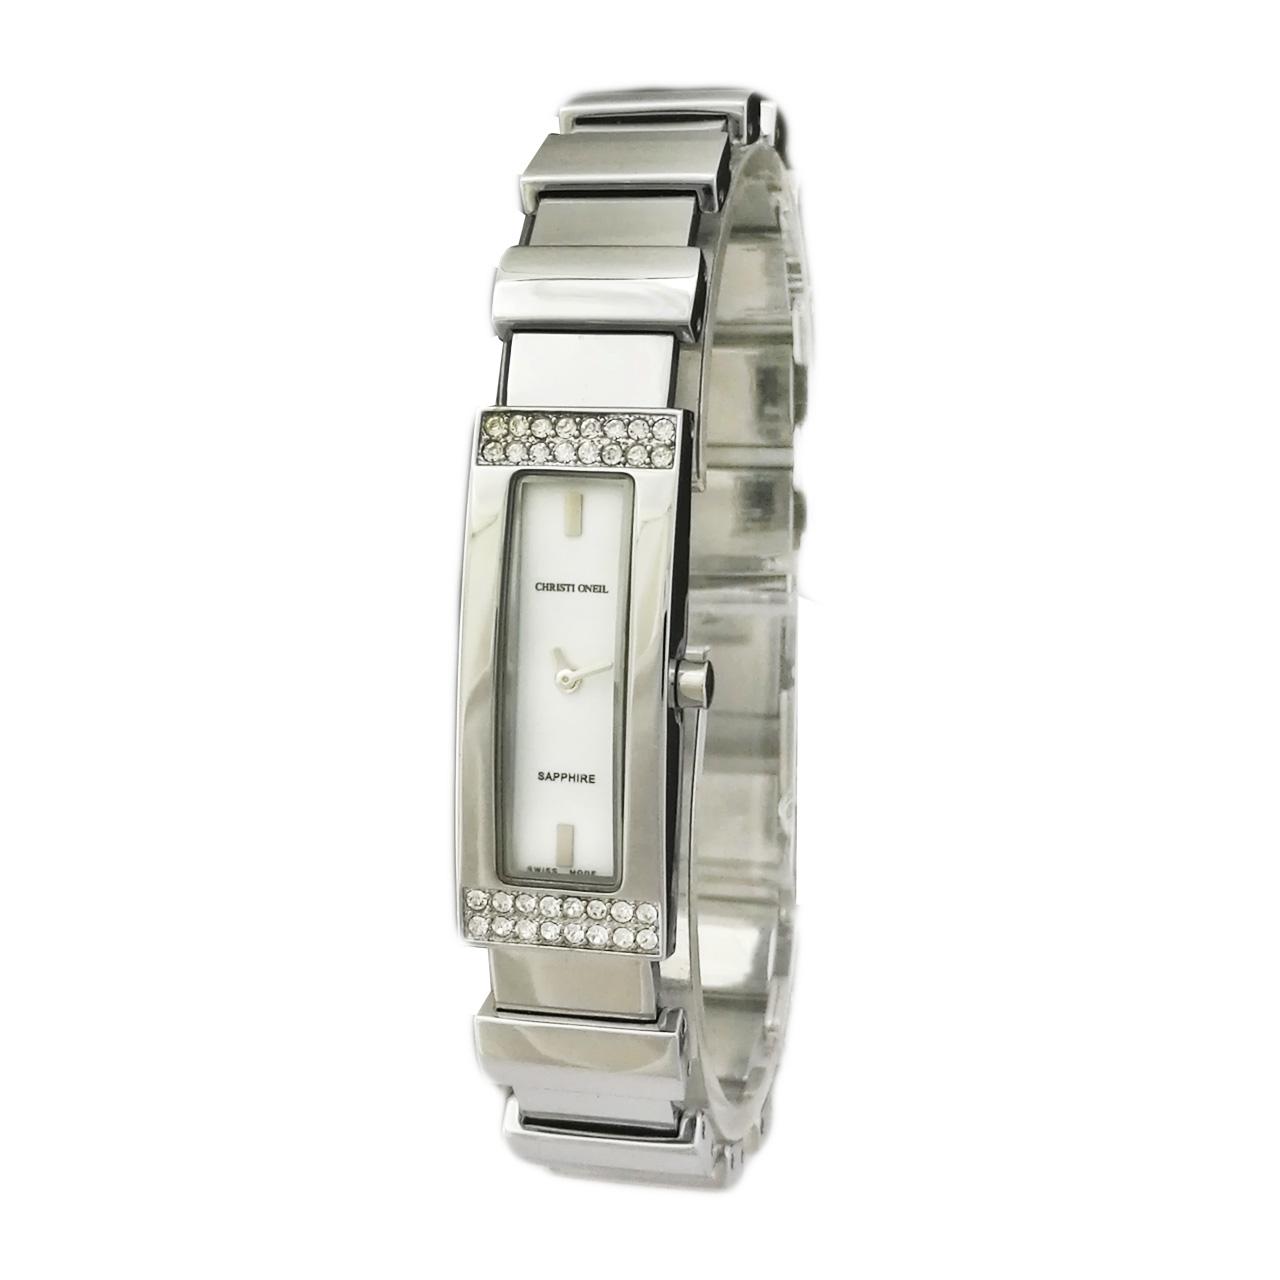 ساعت زنانه برند کریستی اونیل مدل d129